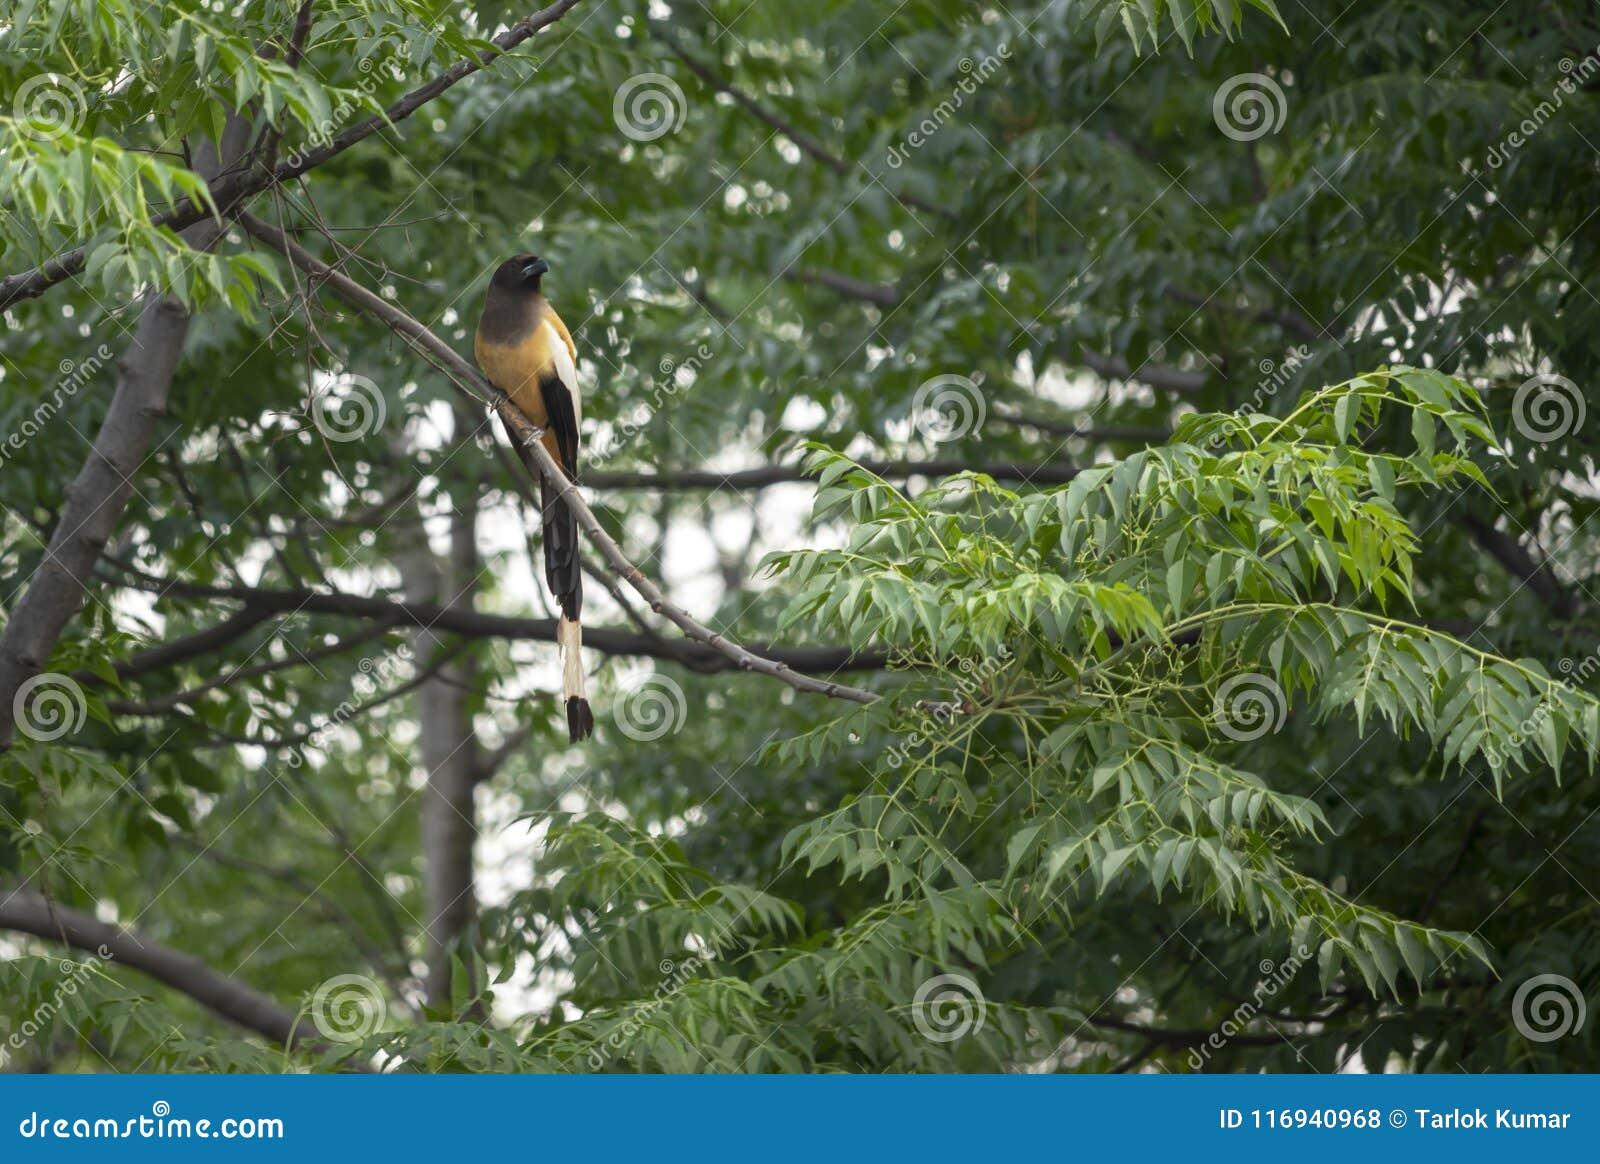 Indien Roufus Treepie